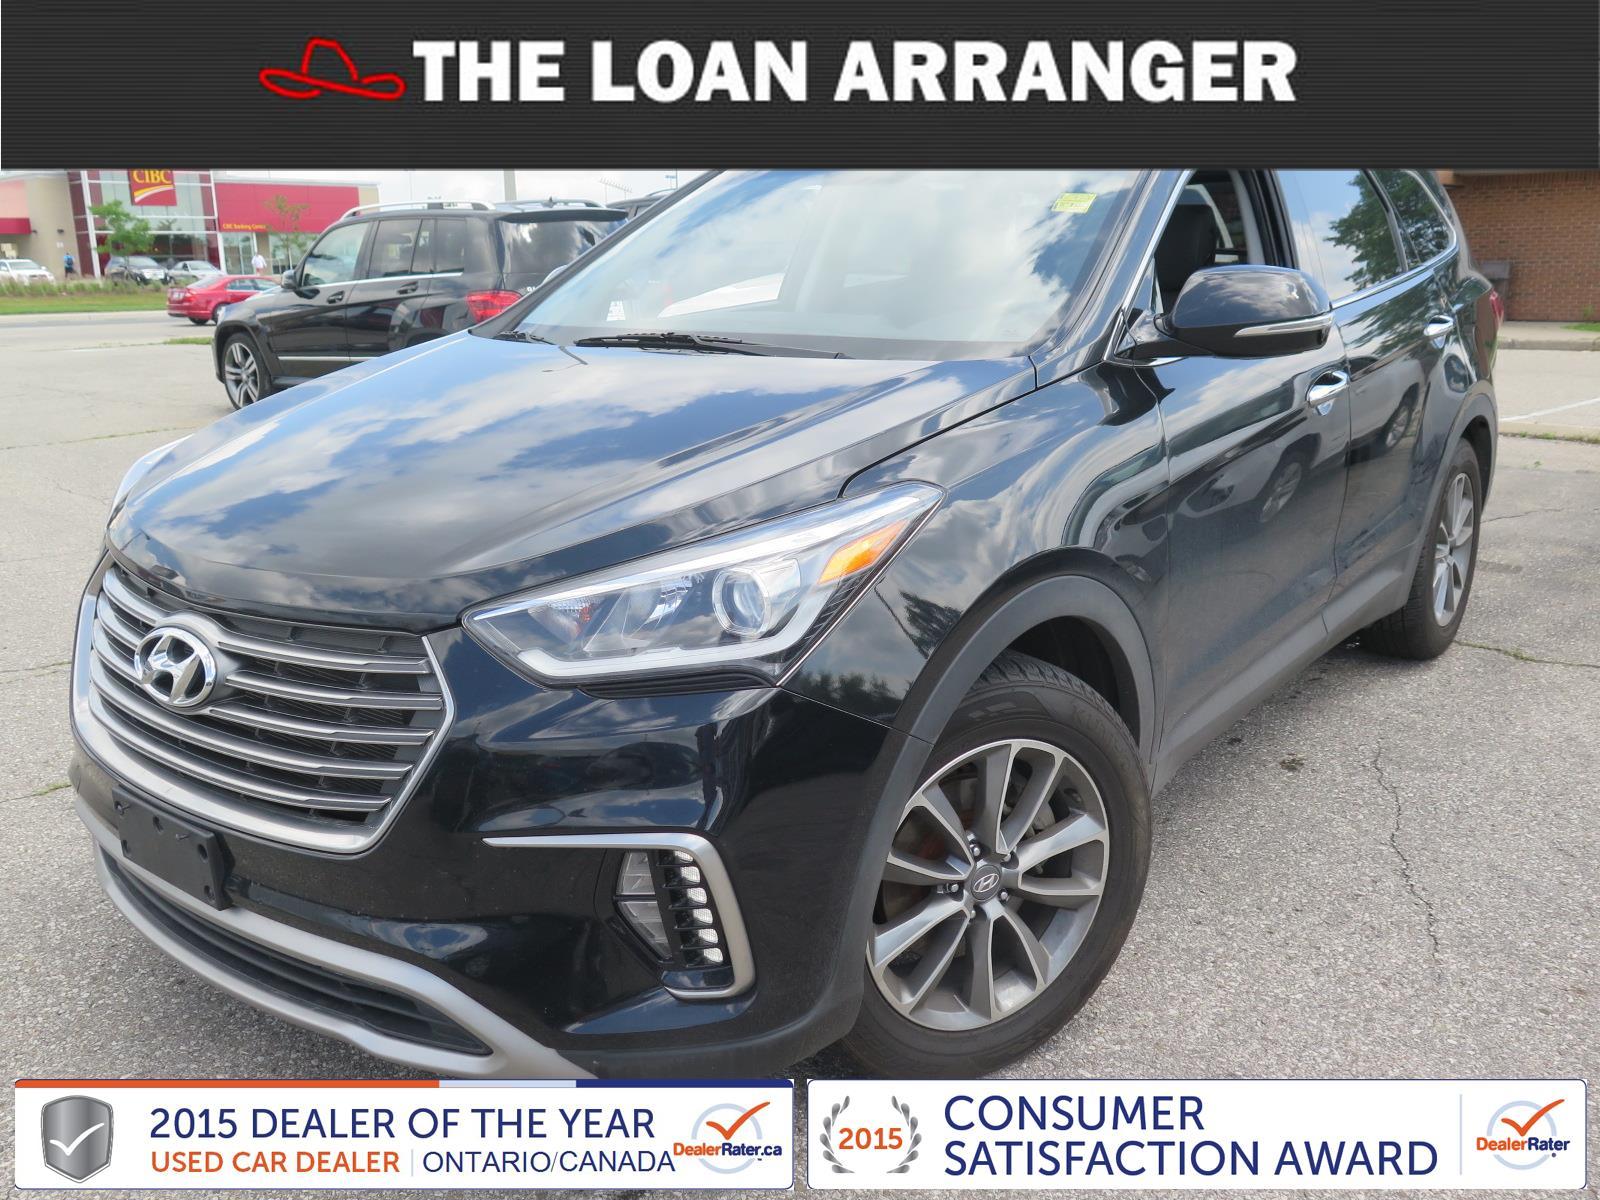 2017 Hyundai Santa Fe - The Loan Arranger Barrie